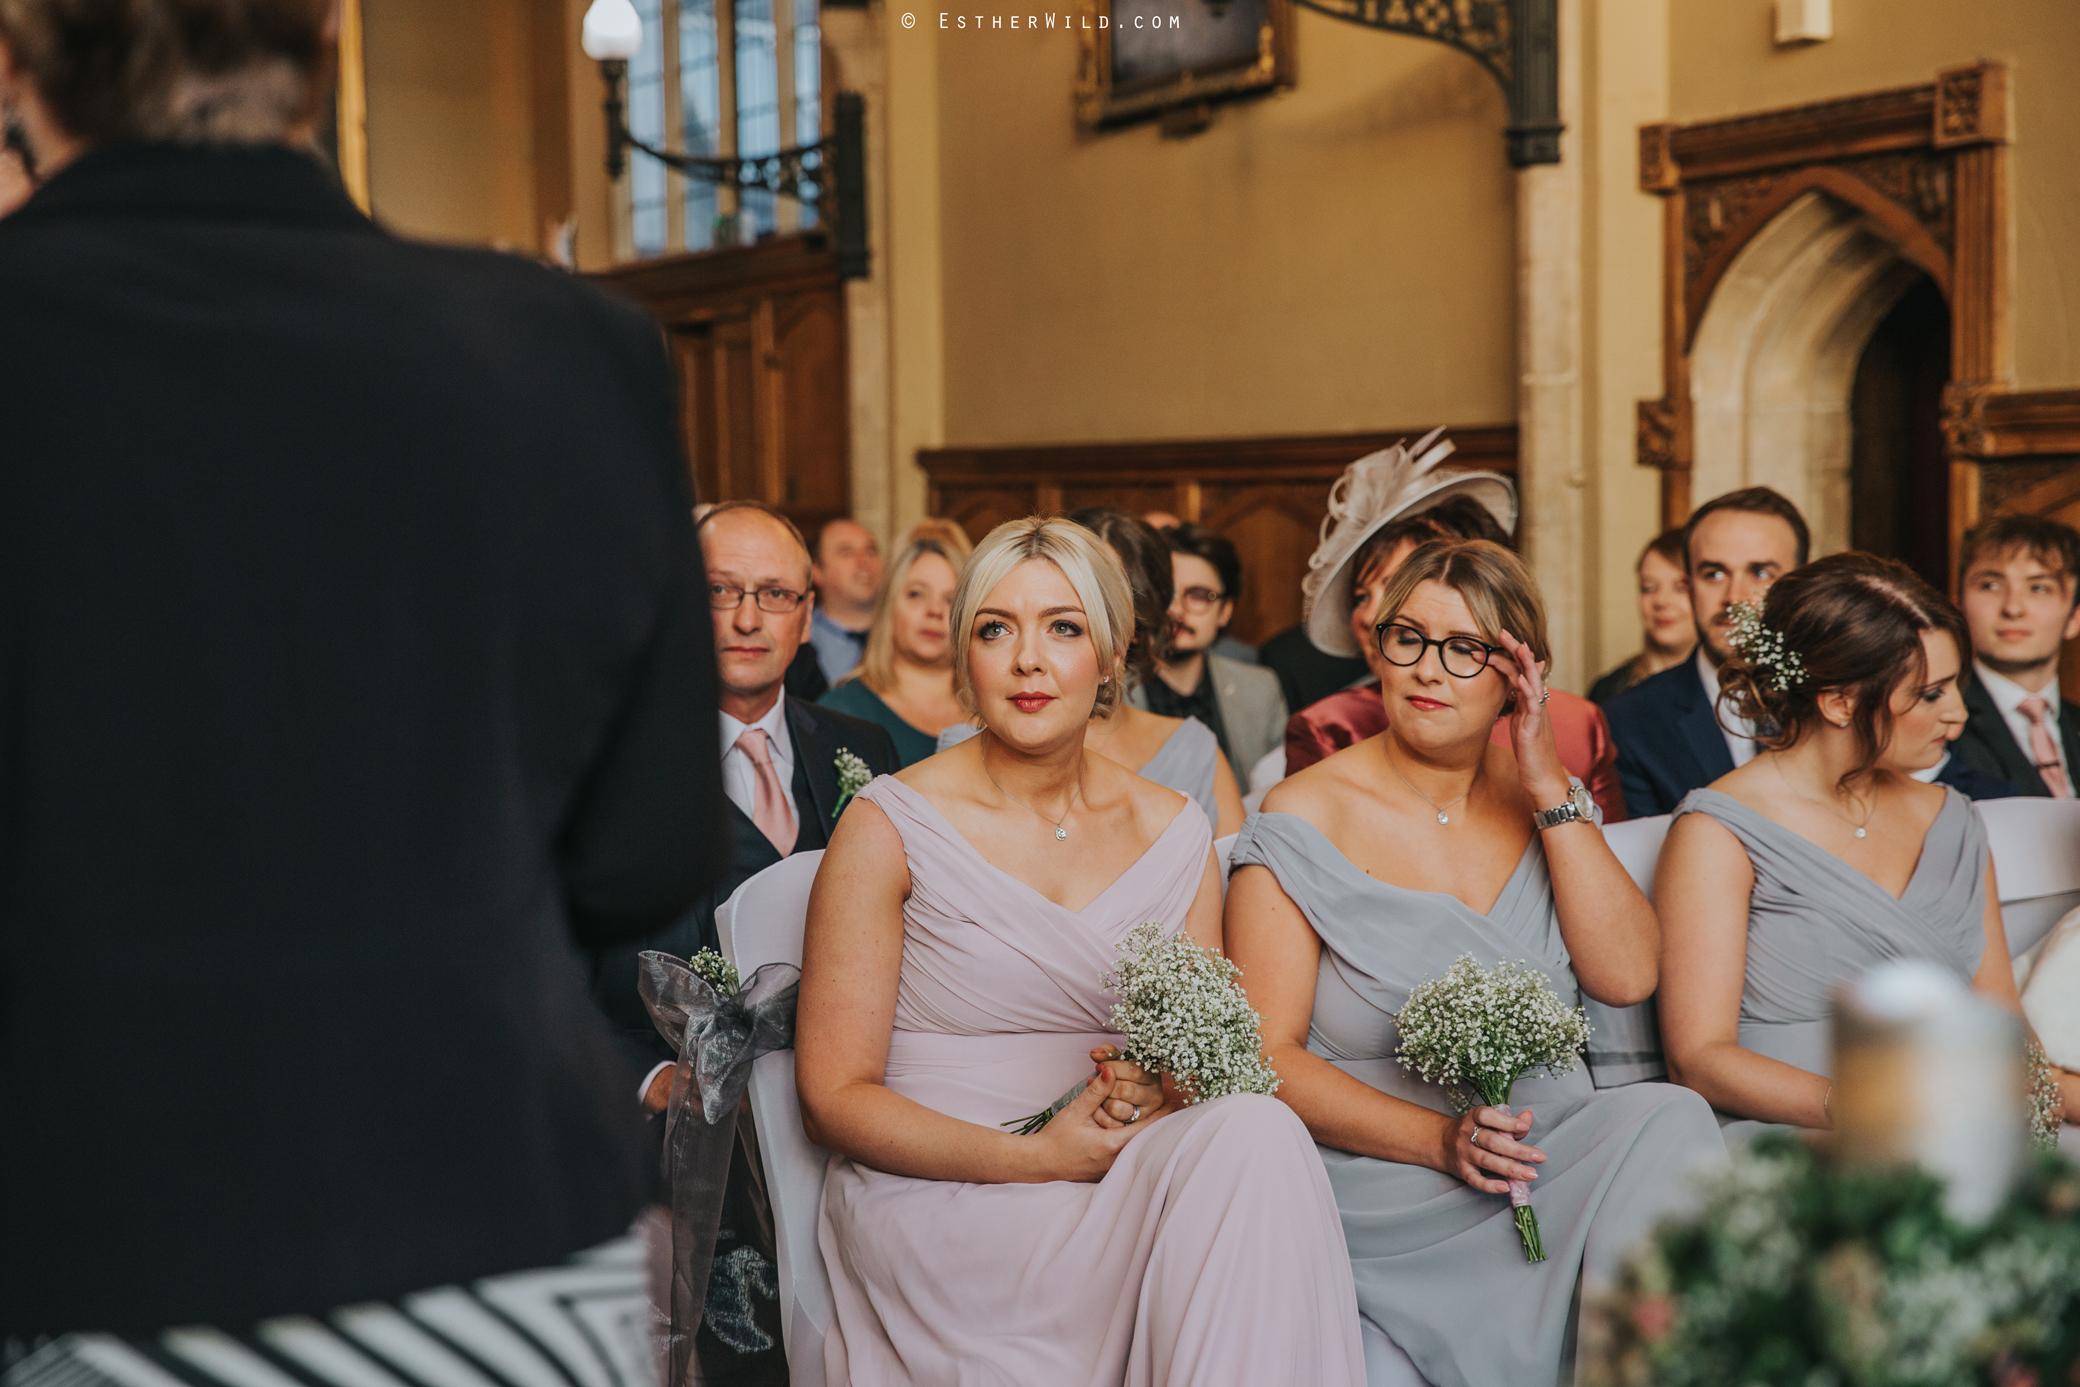 Wedding_Kings_Lynn_Town_Hall_Norfolk_Photographer_Esther_Wild_IMG_0980.jpg